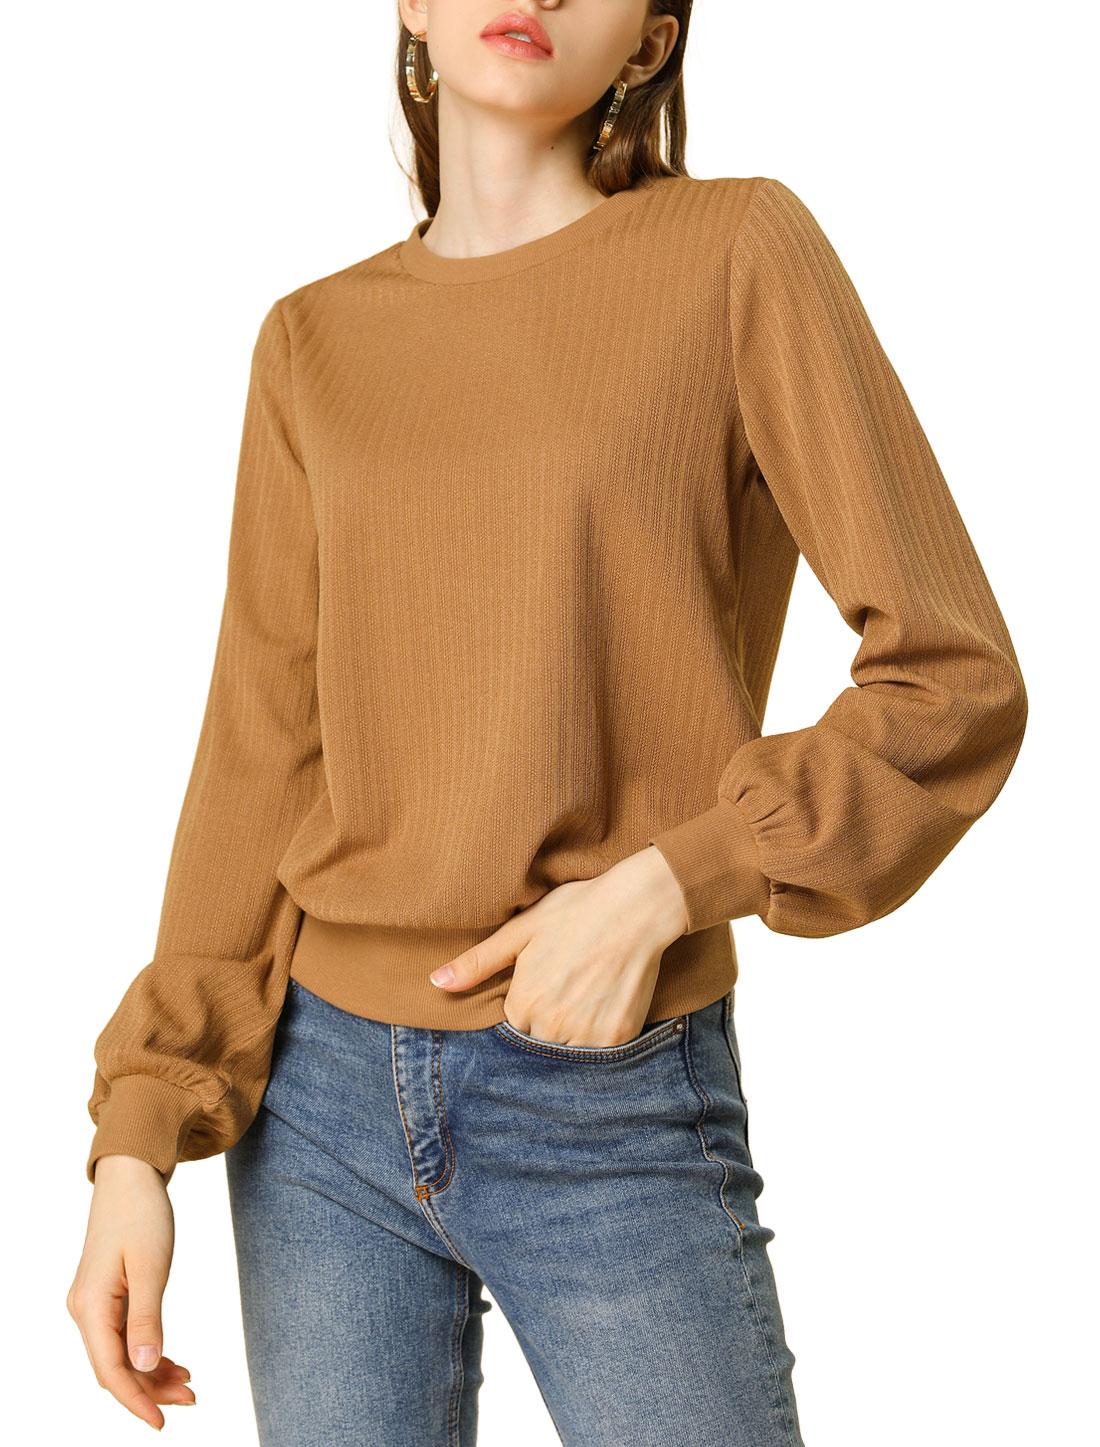 Allegra K Women's Classic Lantern Sleeves Blouson Ribbed Top Sweater Brown L